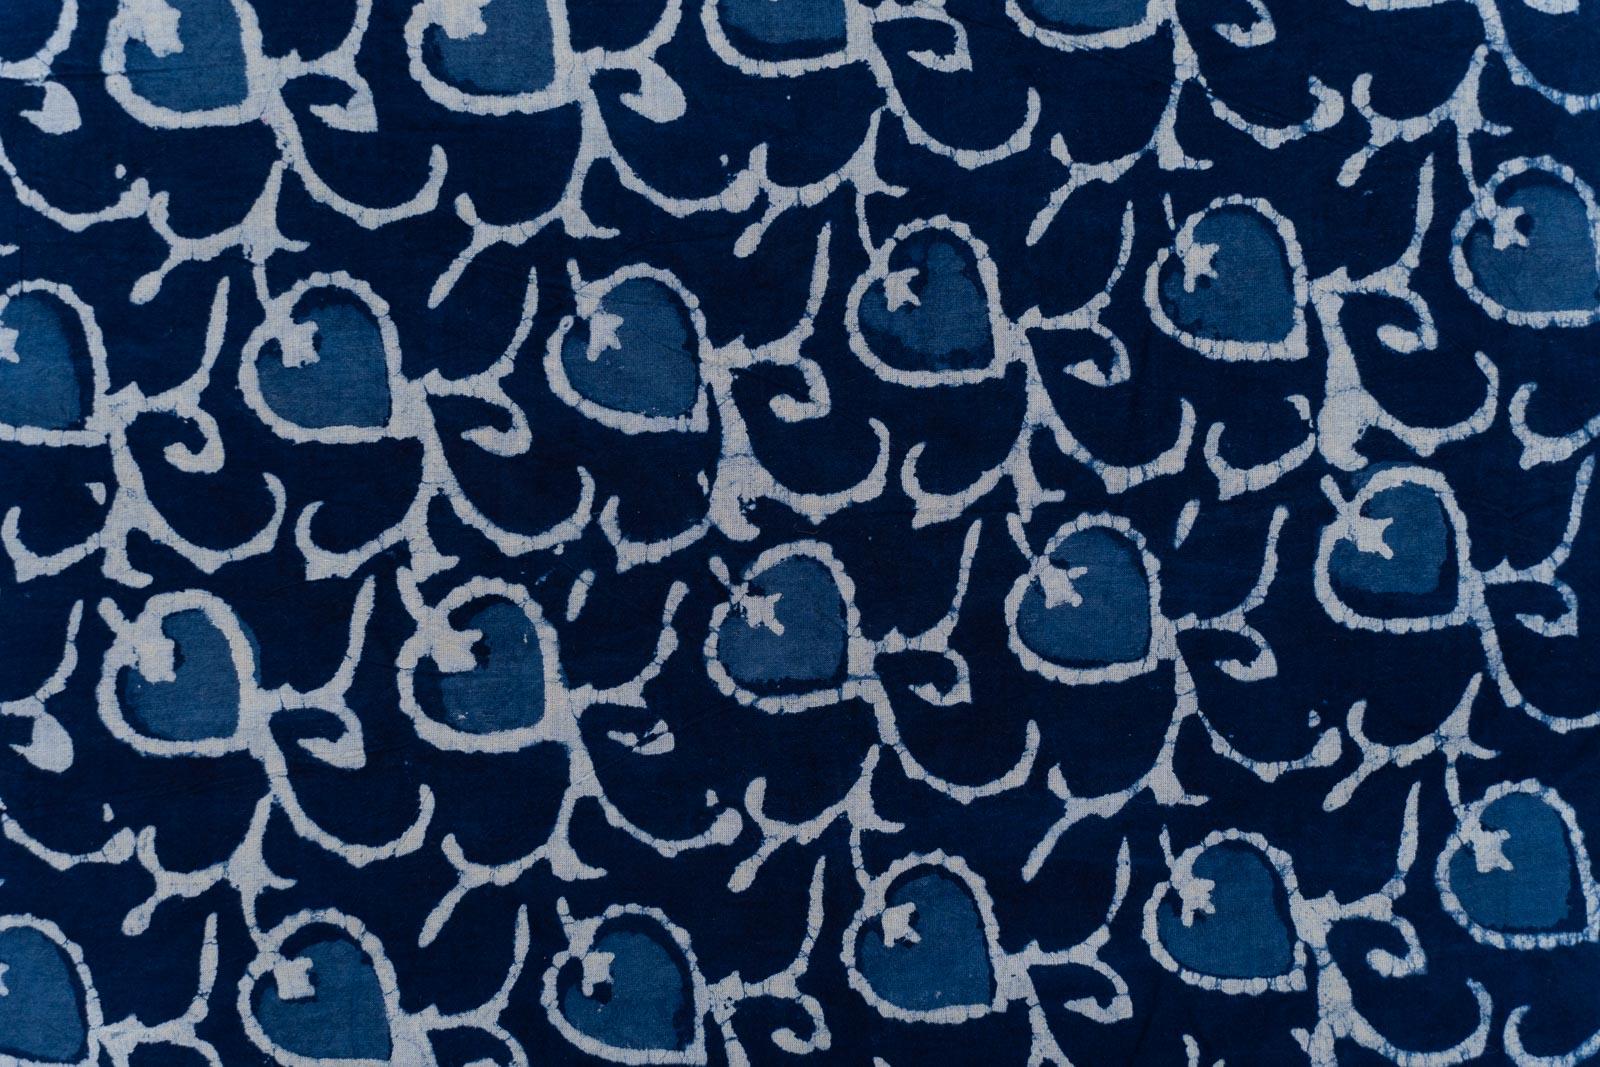 Indigo Leaf Hand Block Printed Fabric